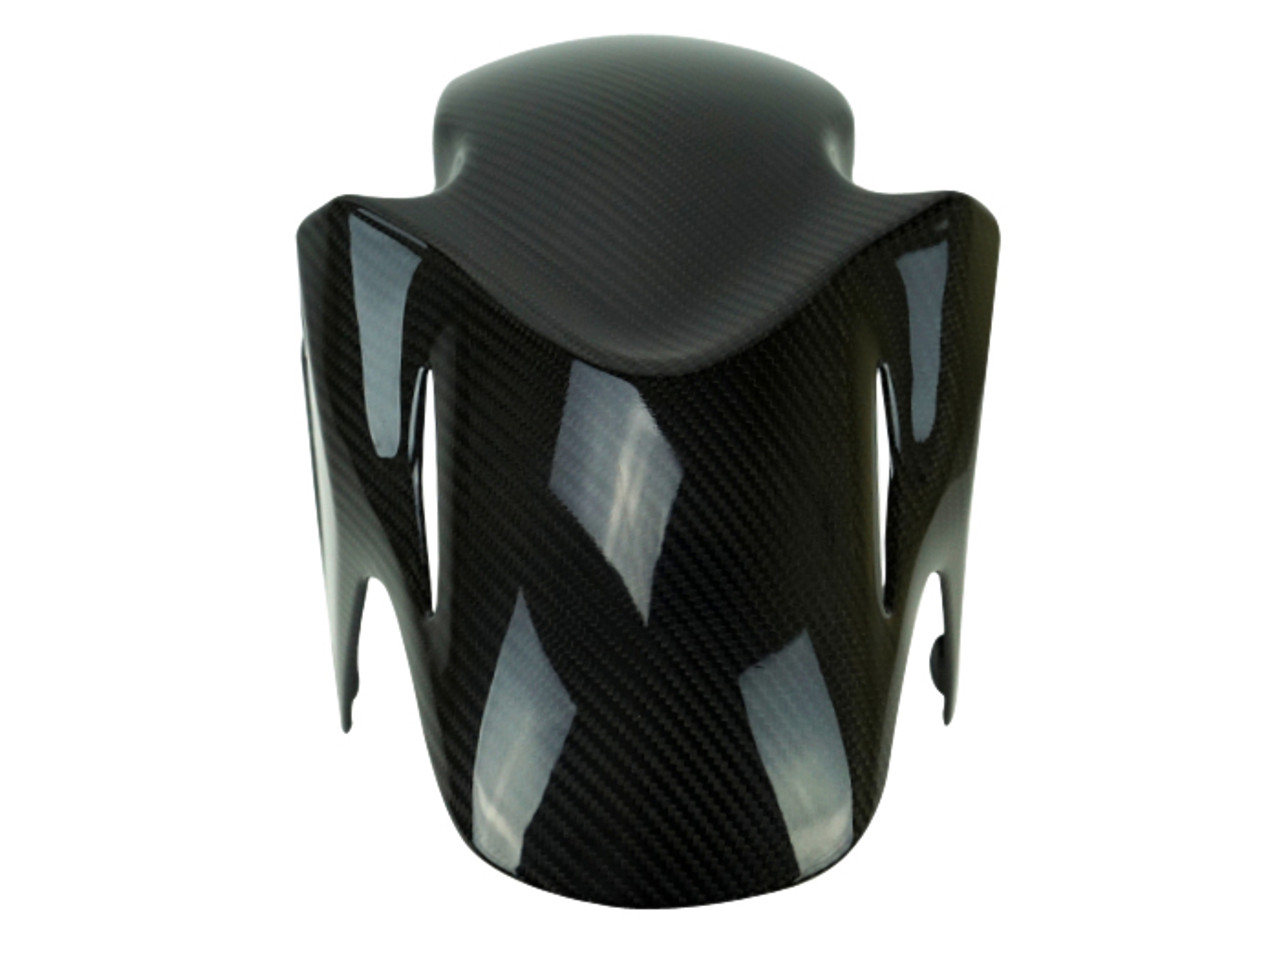 Front Fender in Glossy Twill Weave Carbon Fiber for Honda CBR500R, CB500F, CB500X 2015+